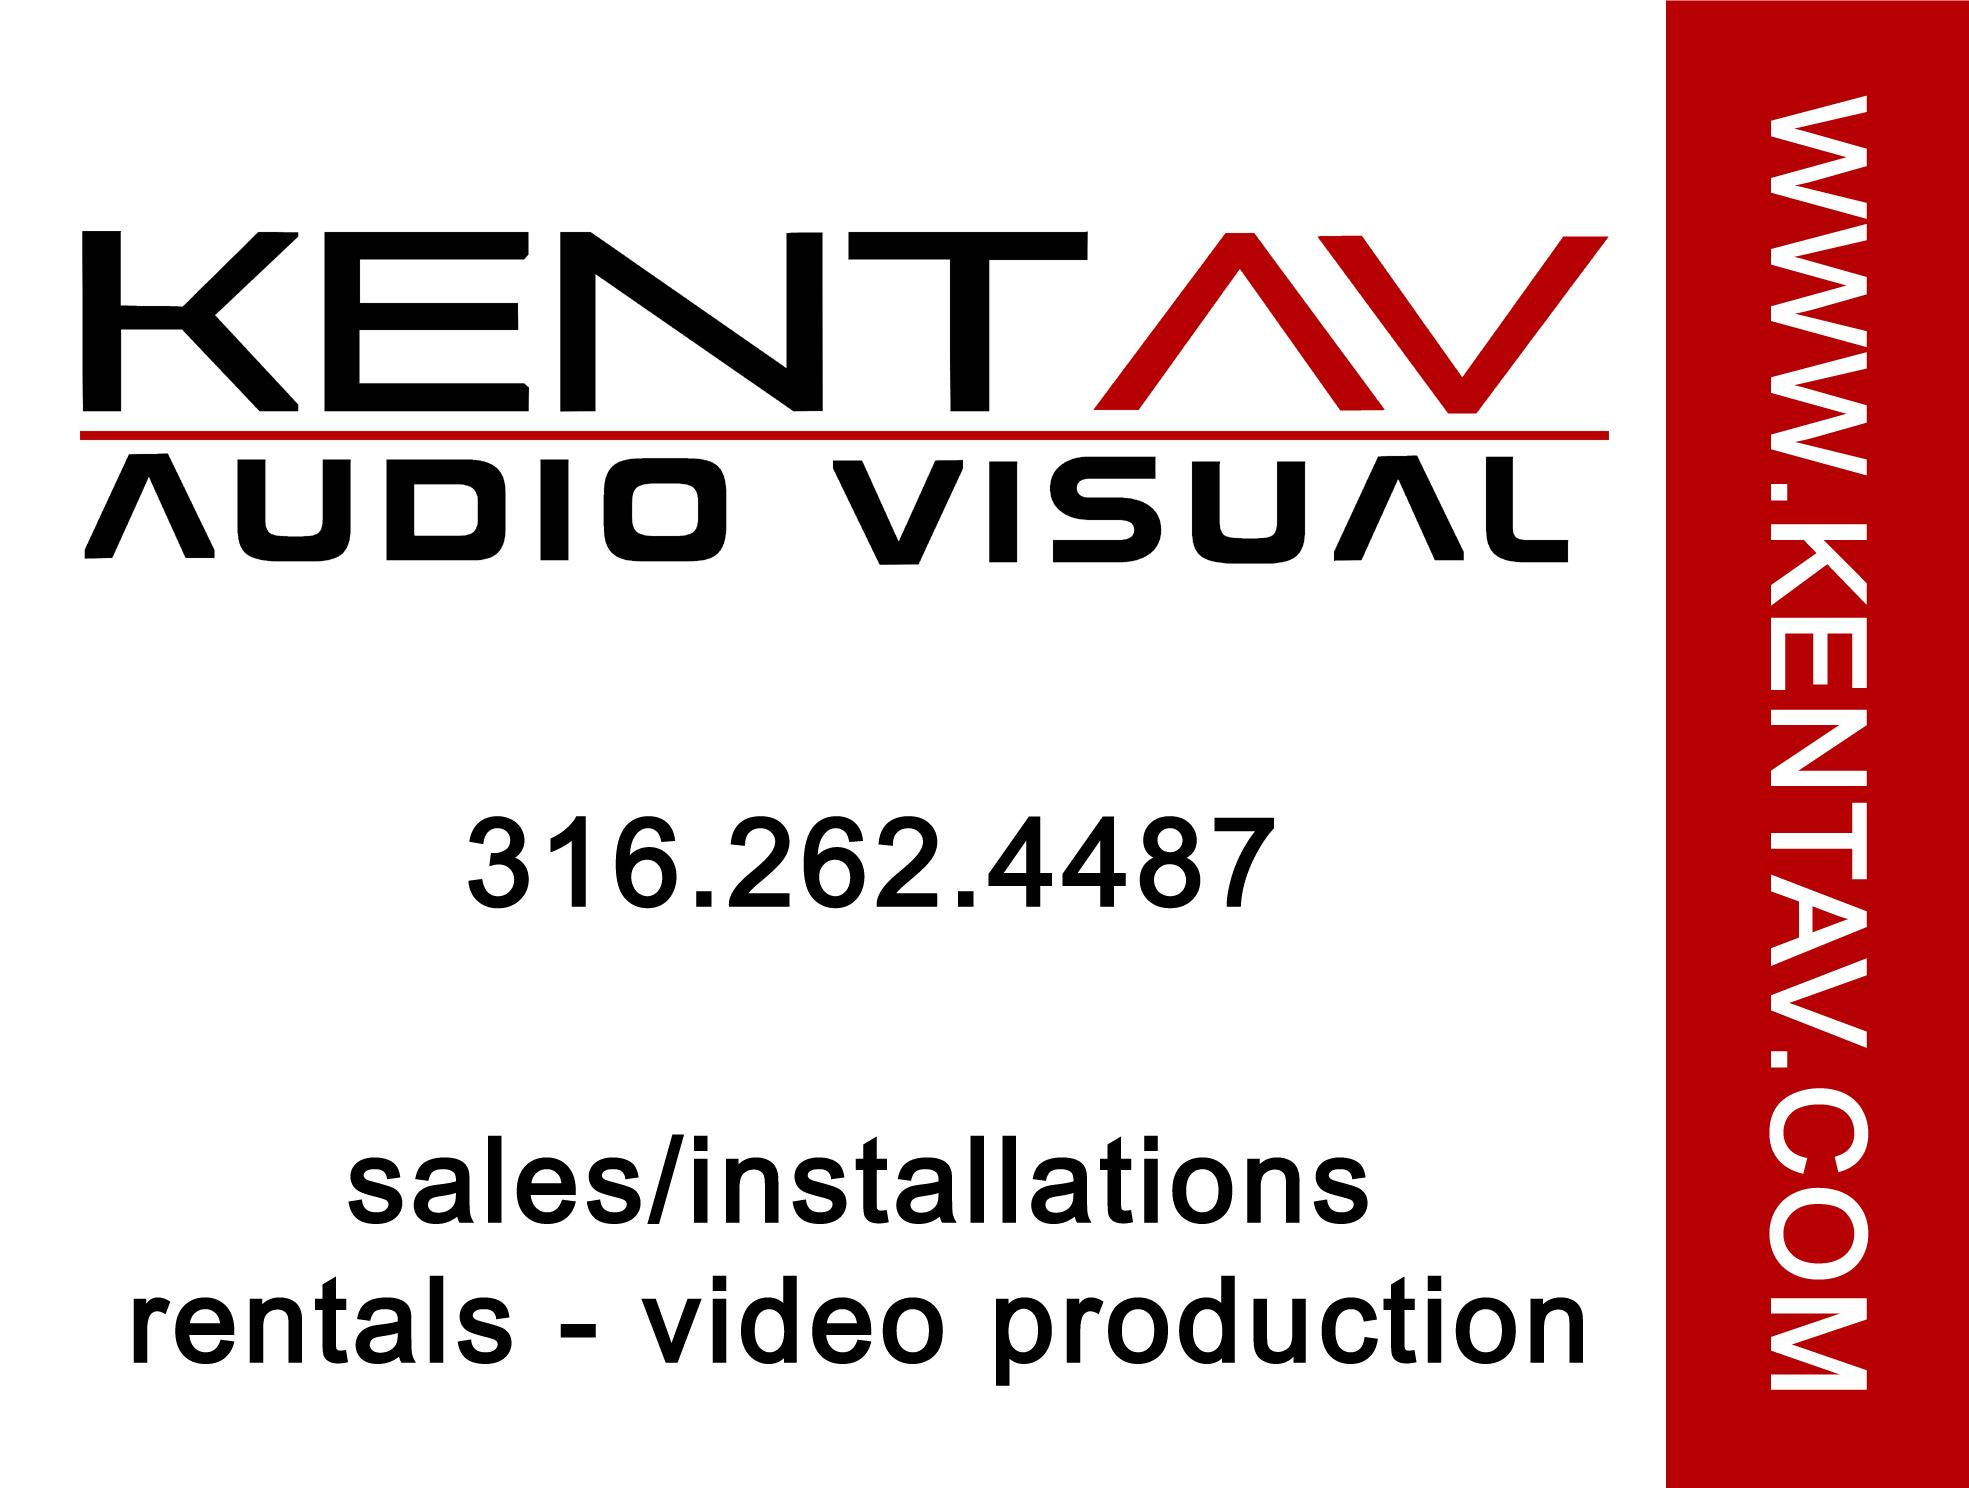 Kent Audio Visual